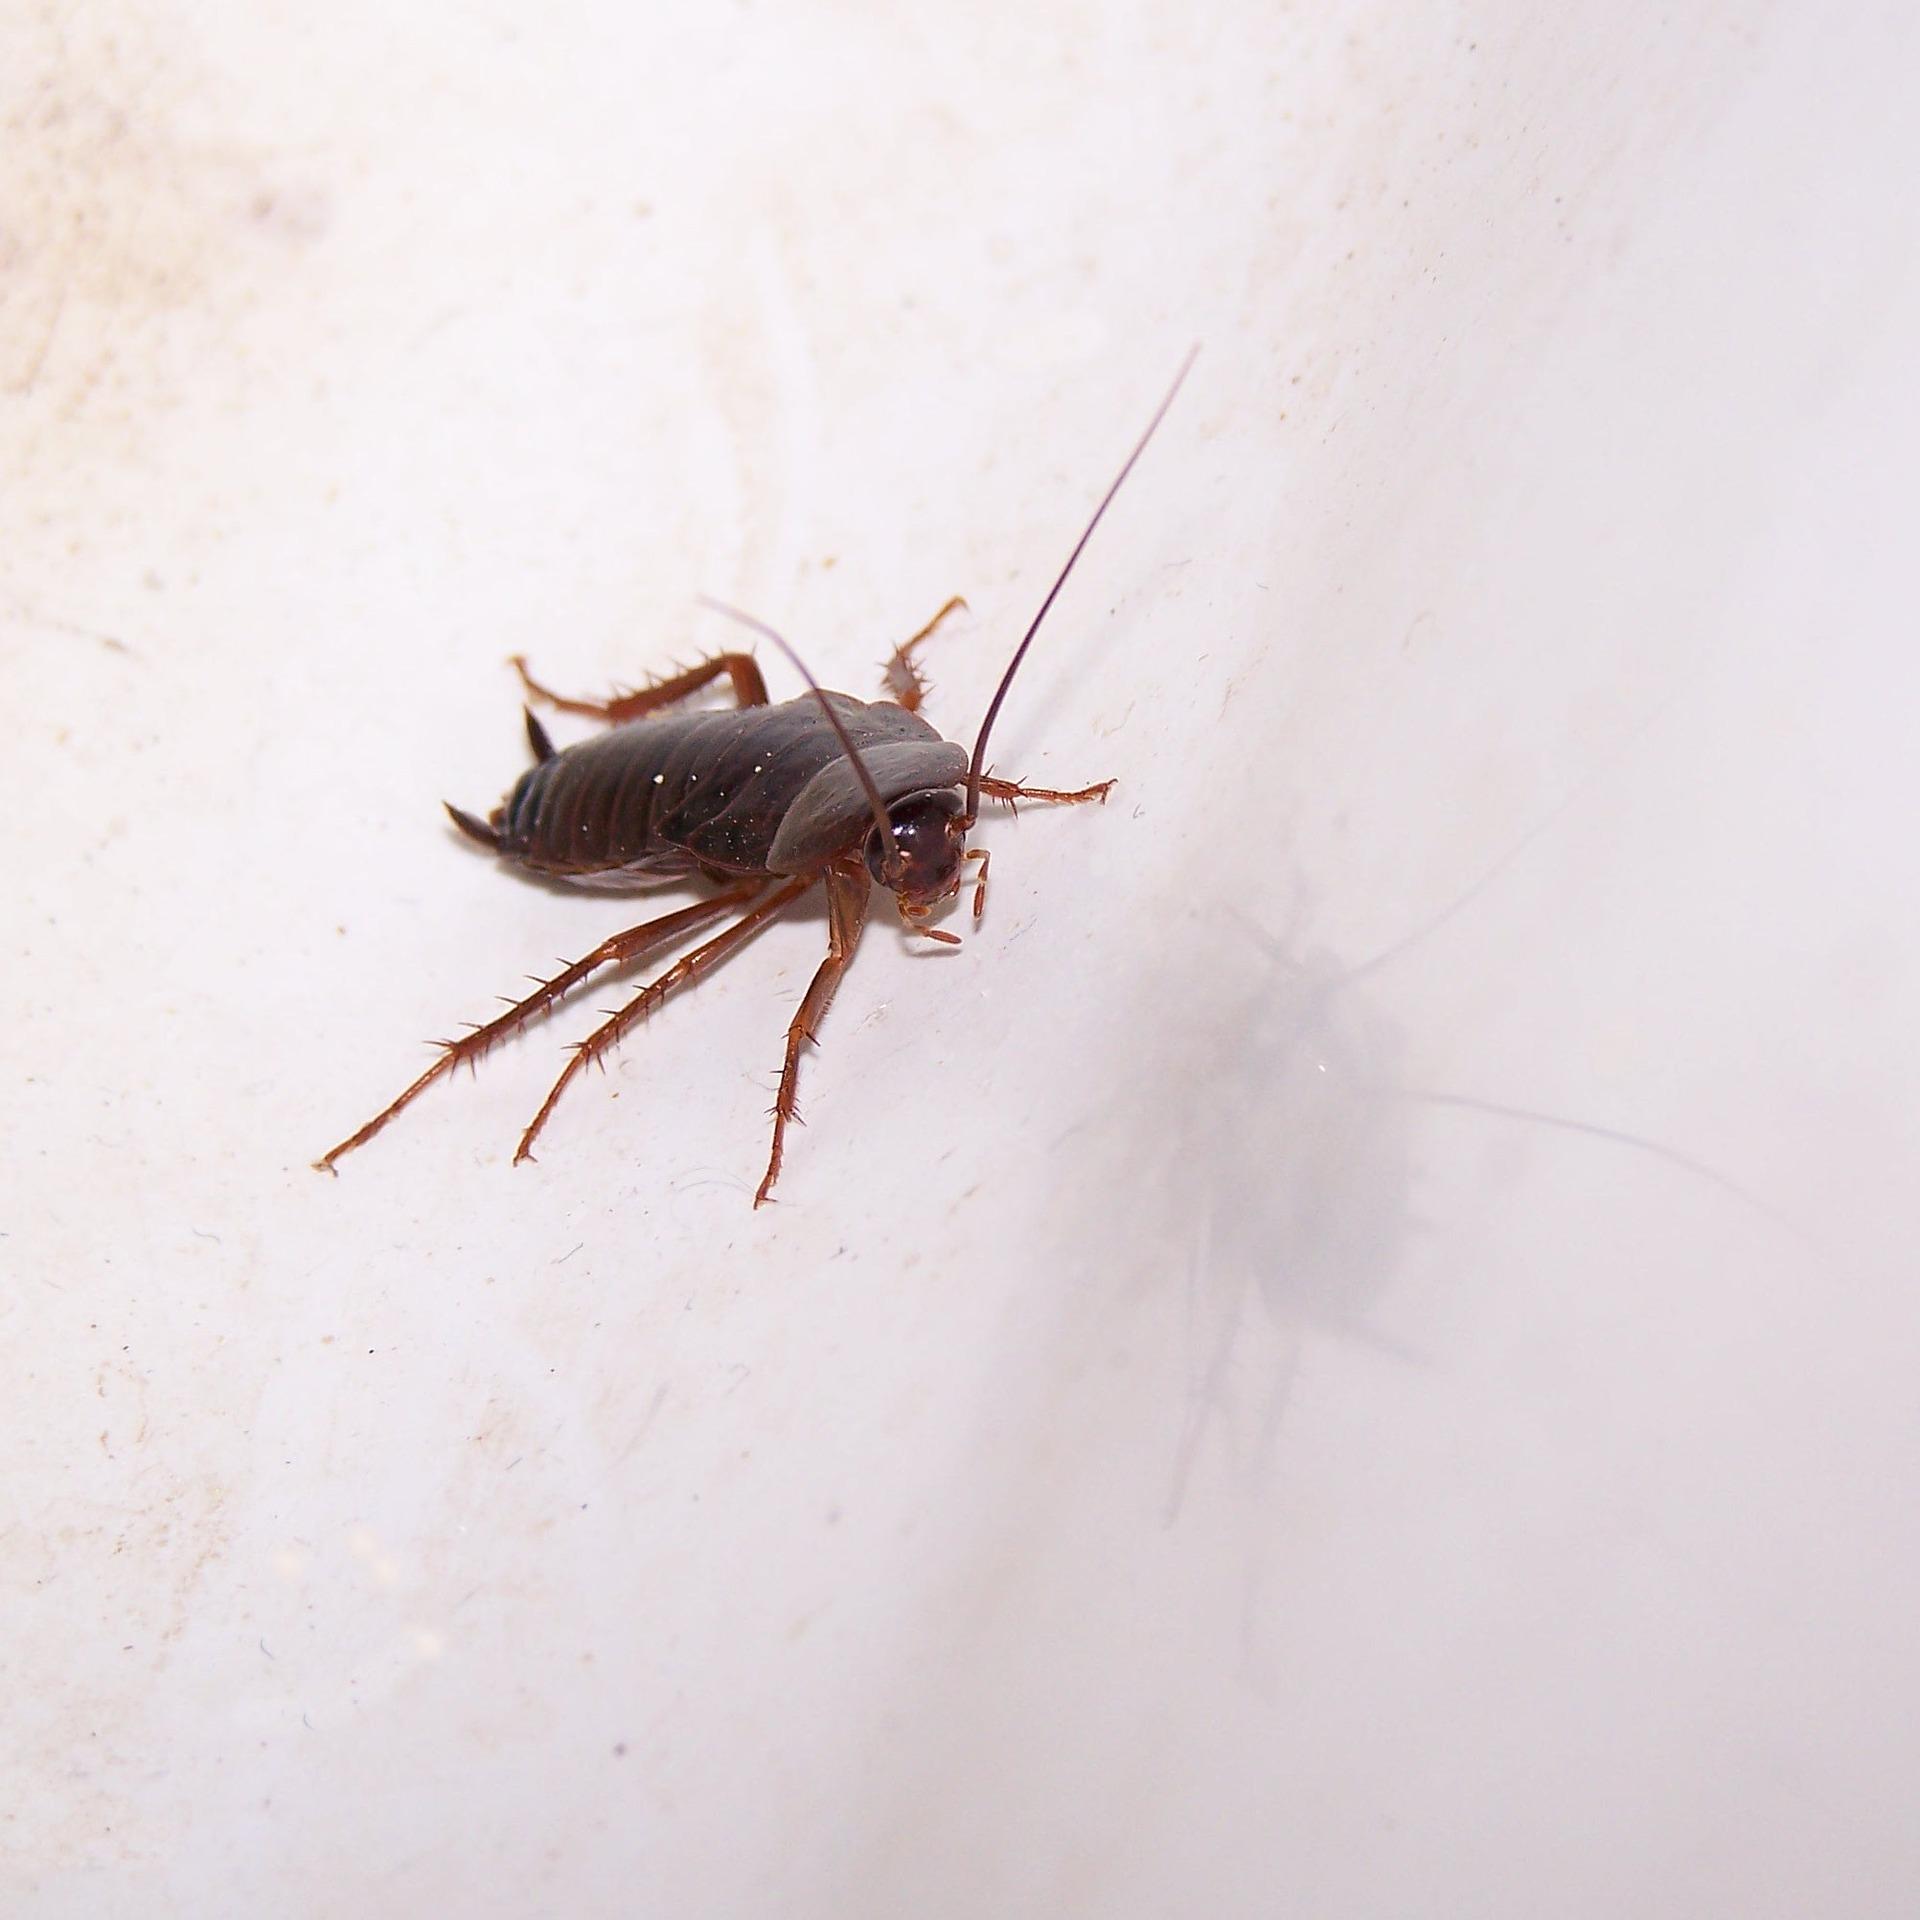 cockroach-667043_1920.jpg